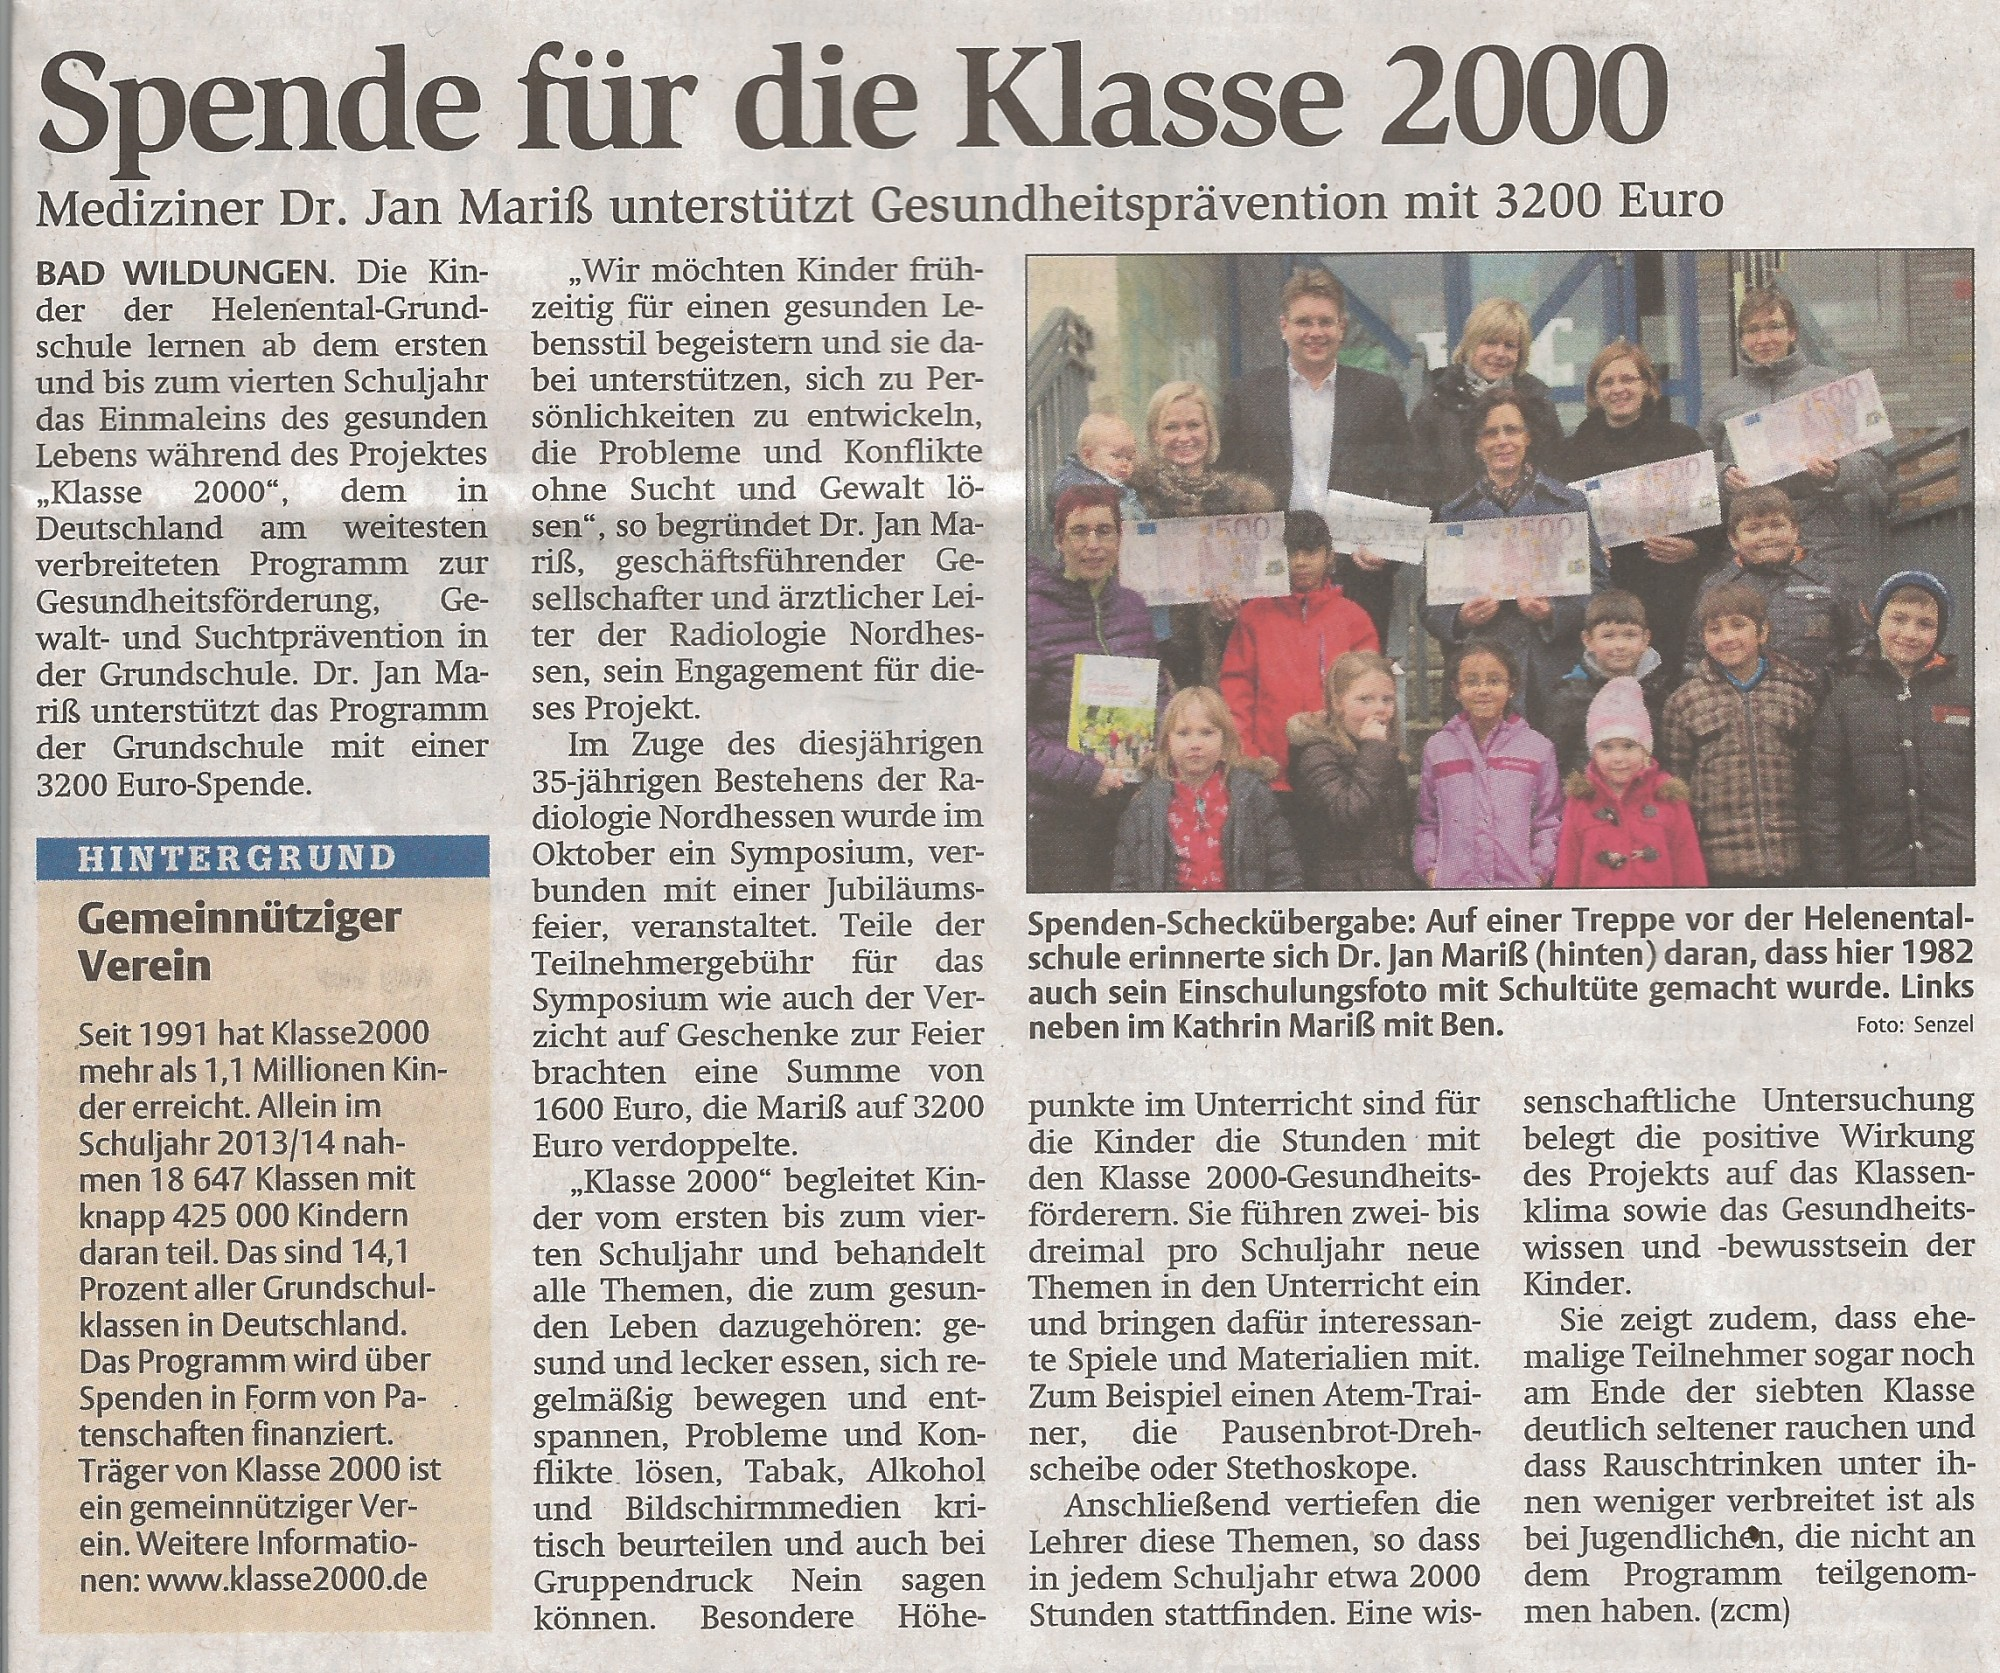 2014-12-23 HNA Spende Klasse 2000